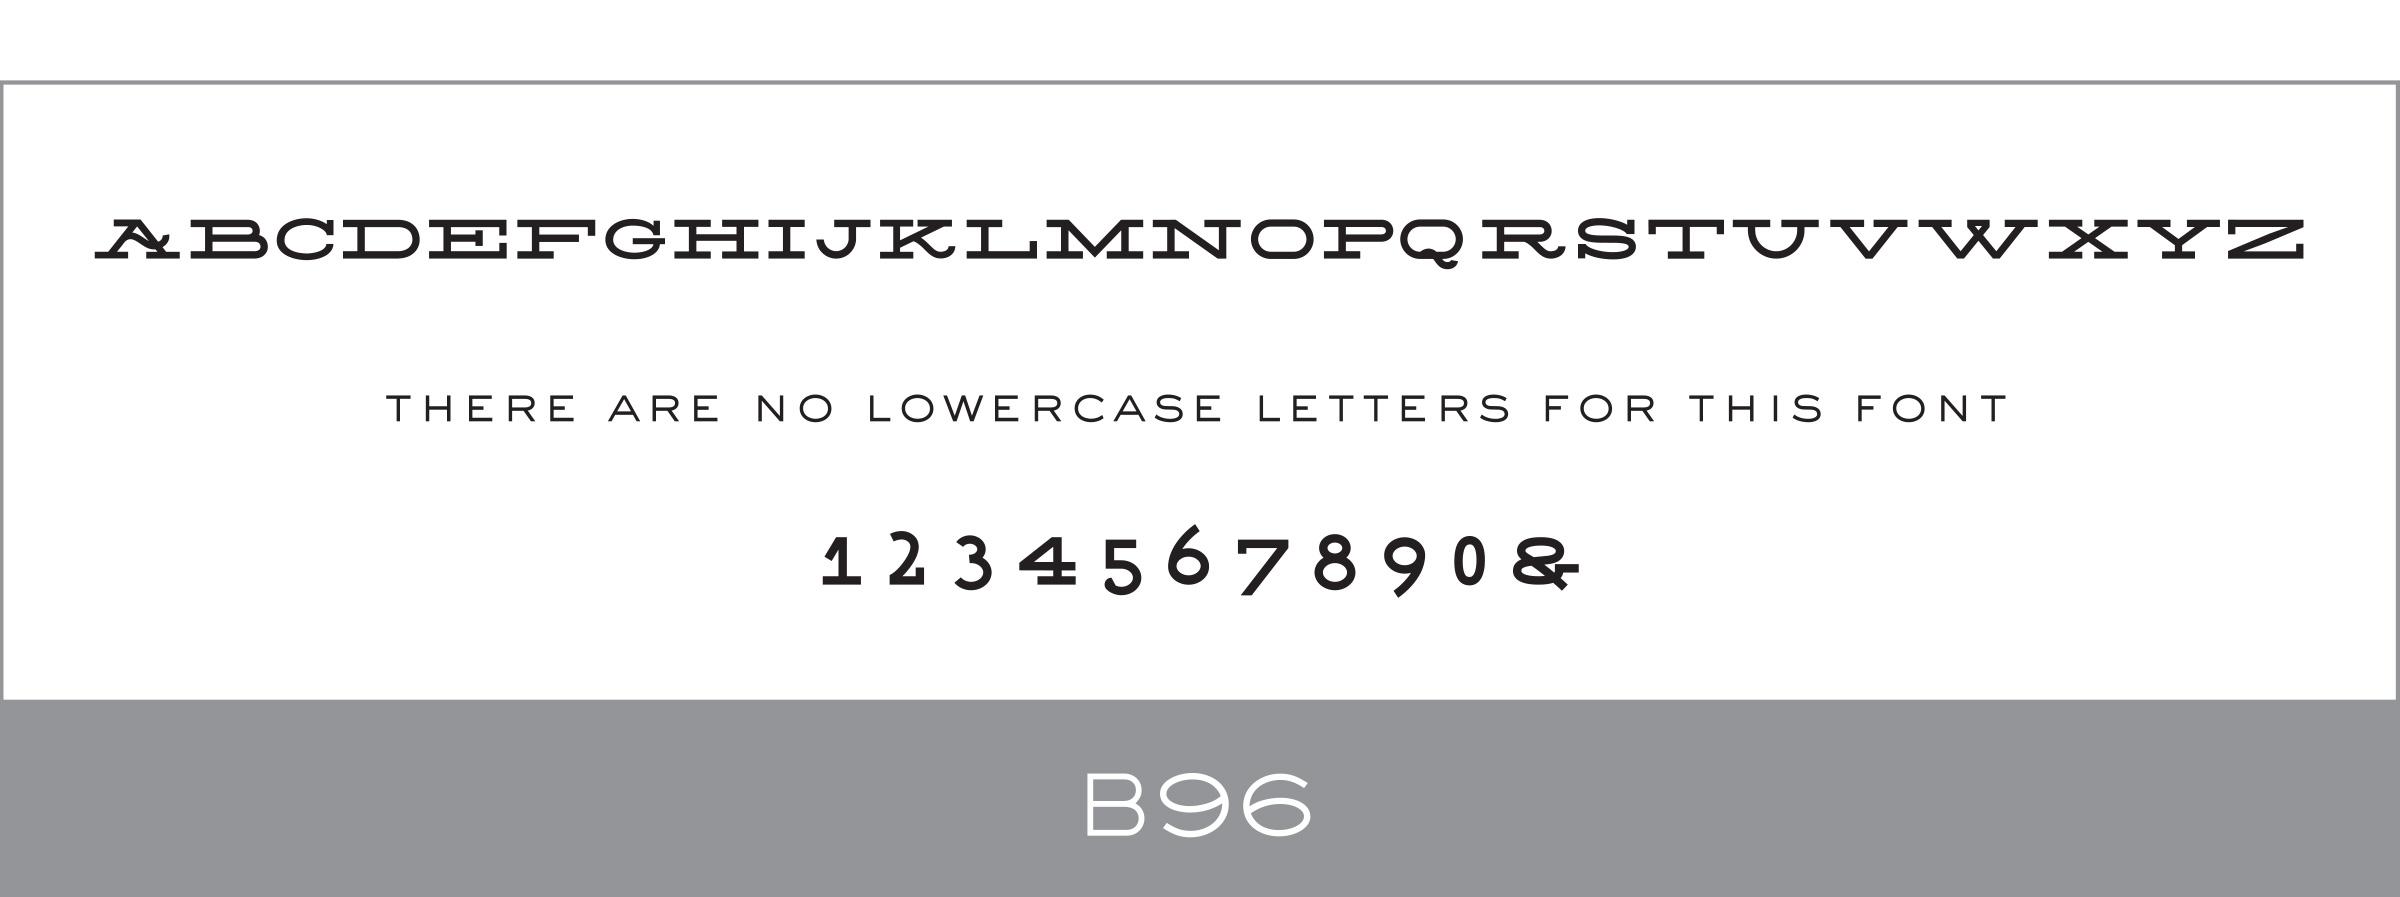 B96_Haute_Papier_Font.jpg